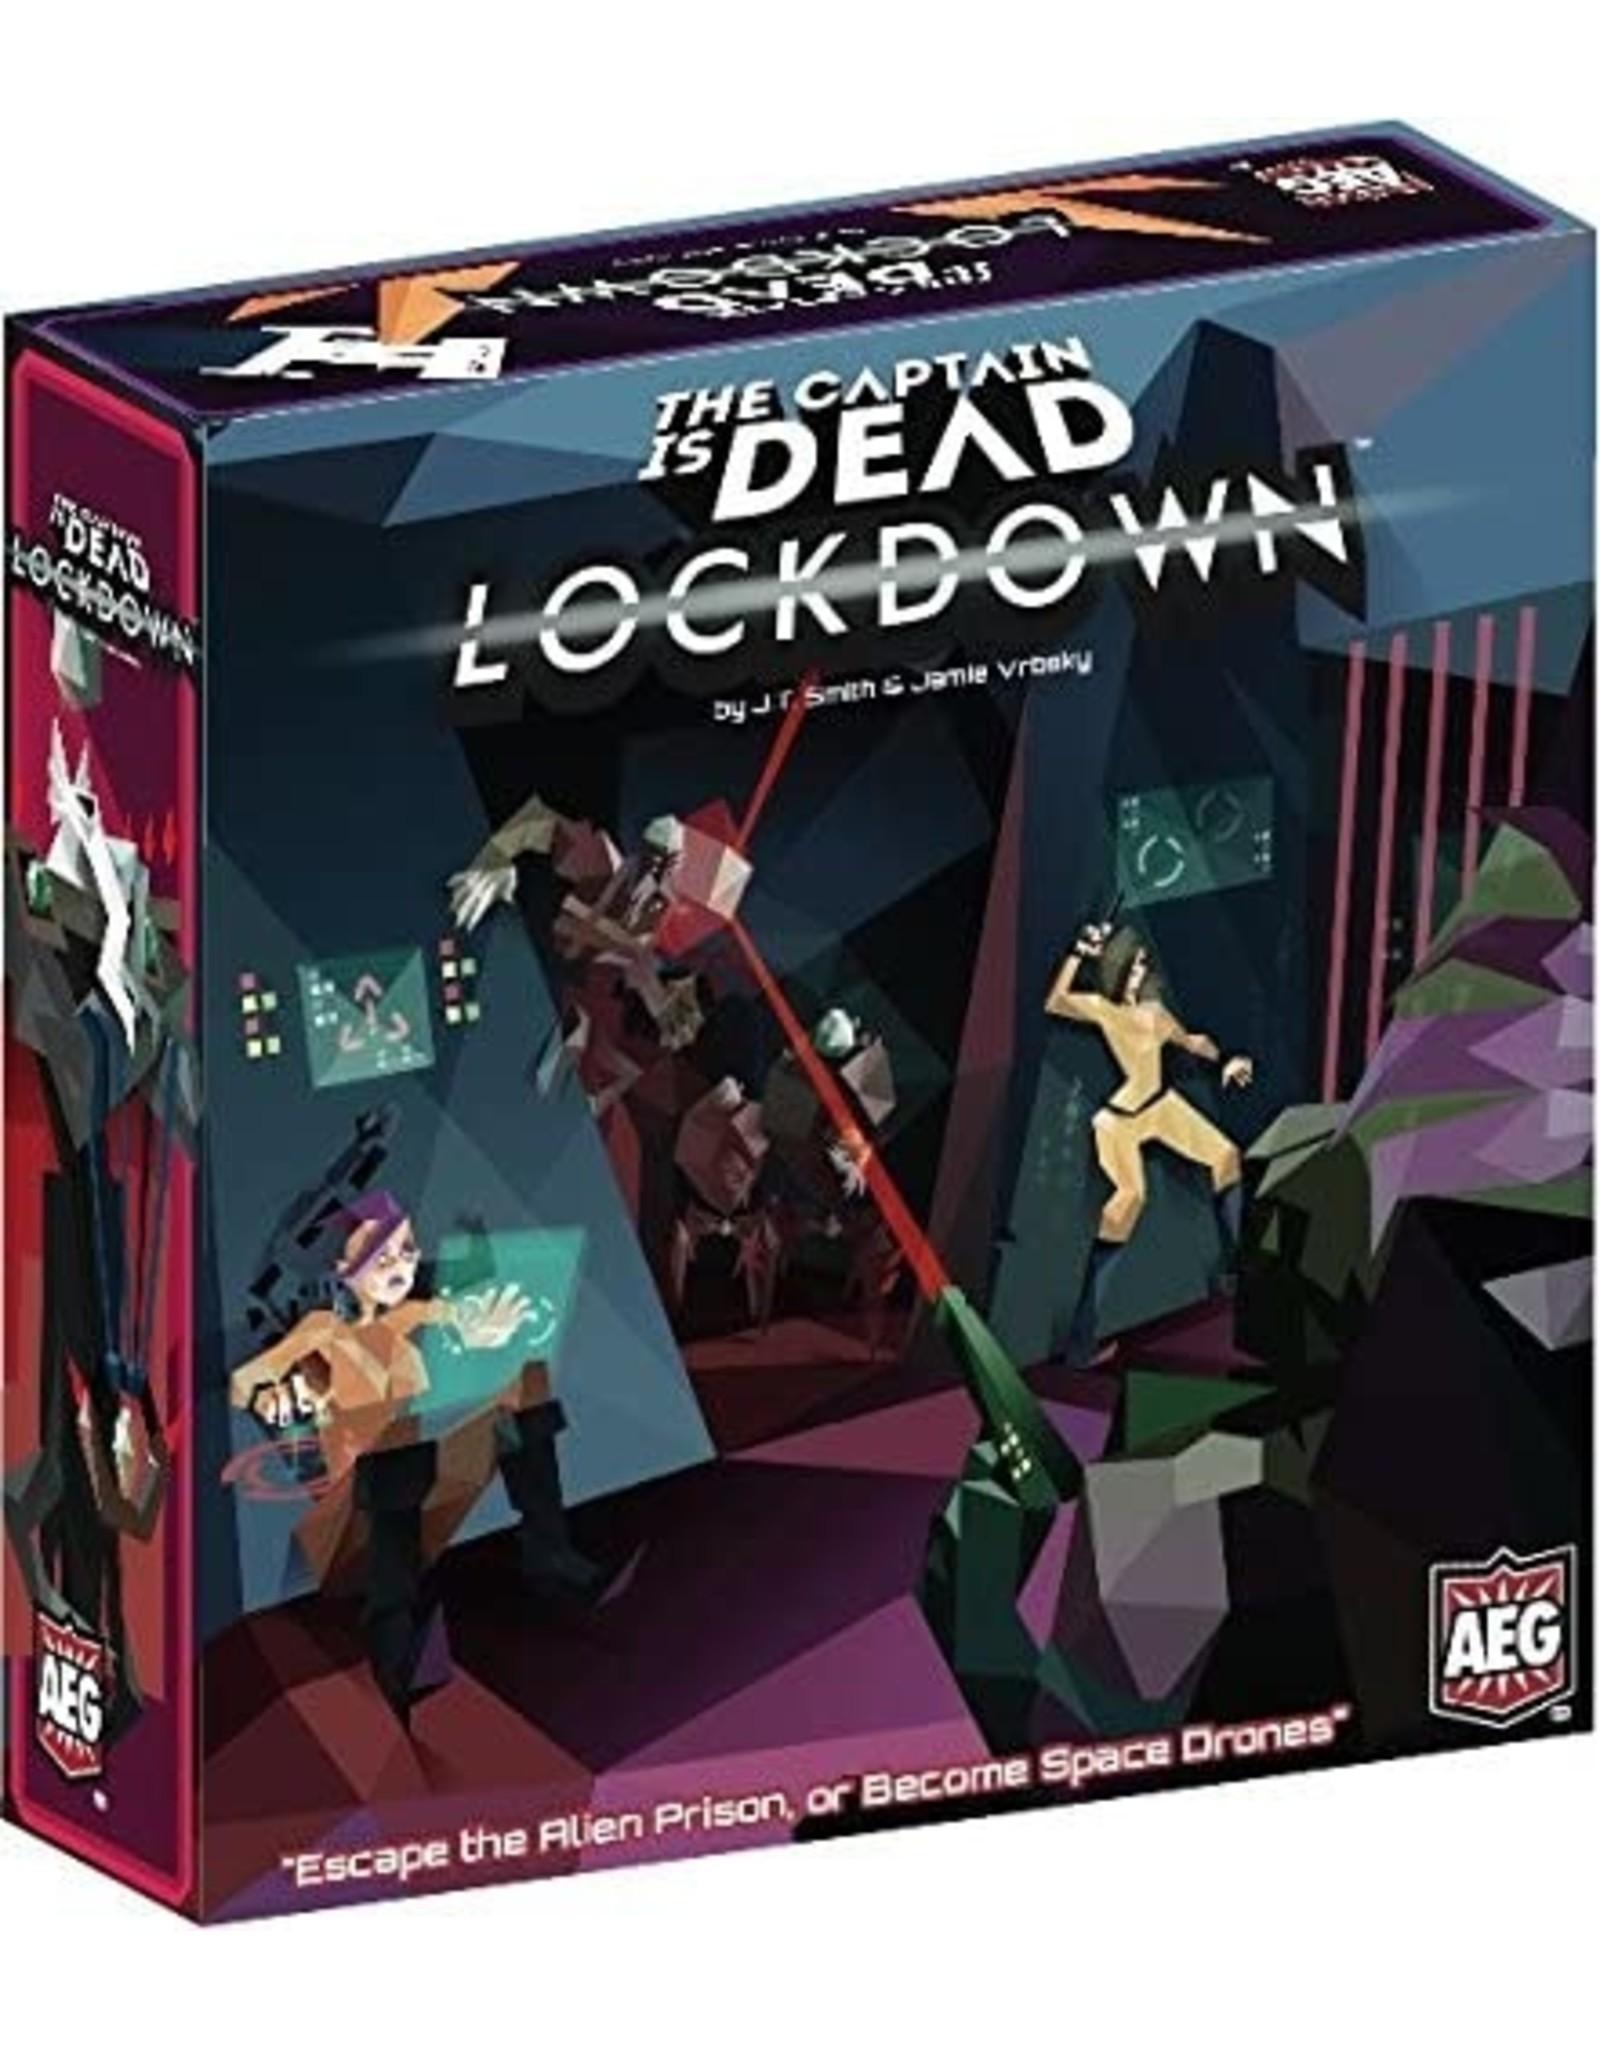 The Captain is Dead: Lockdown